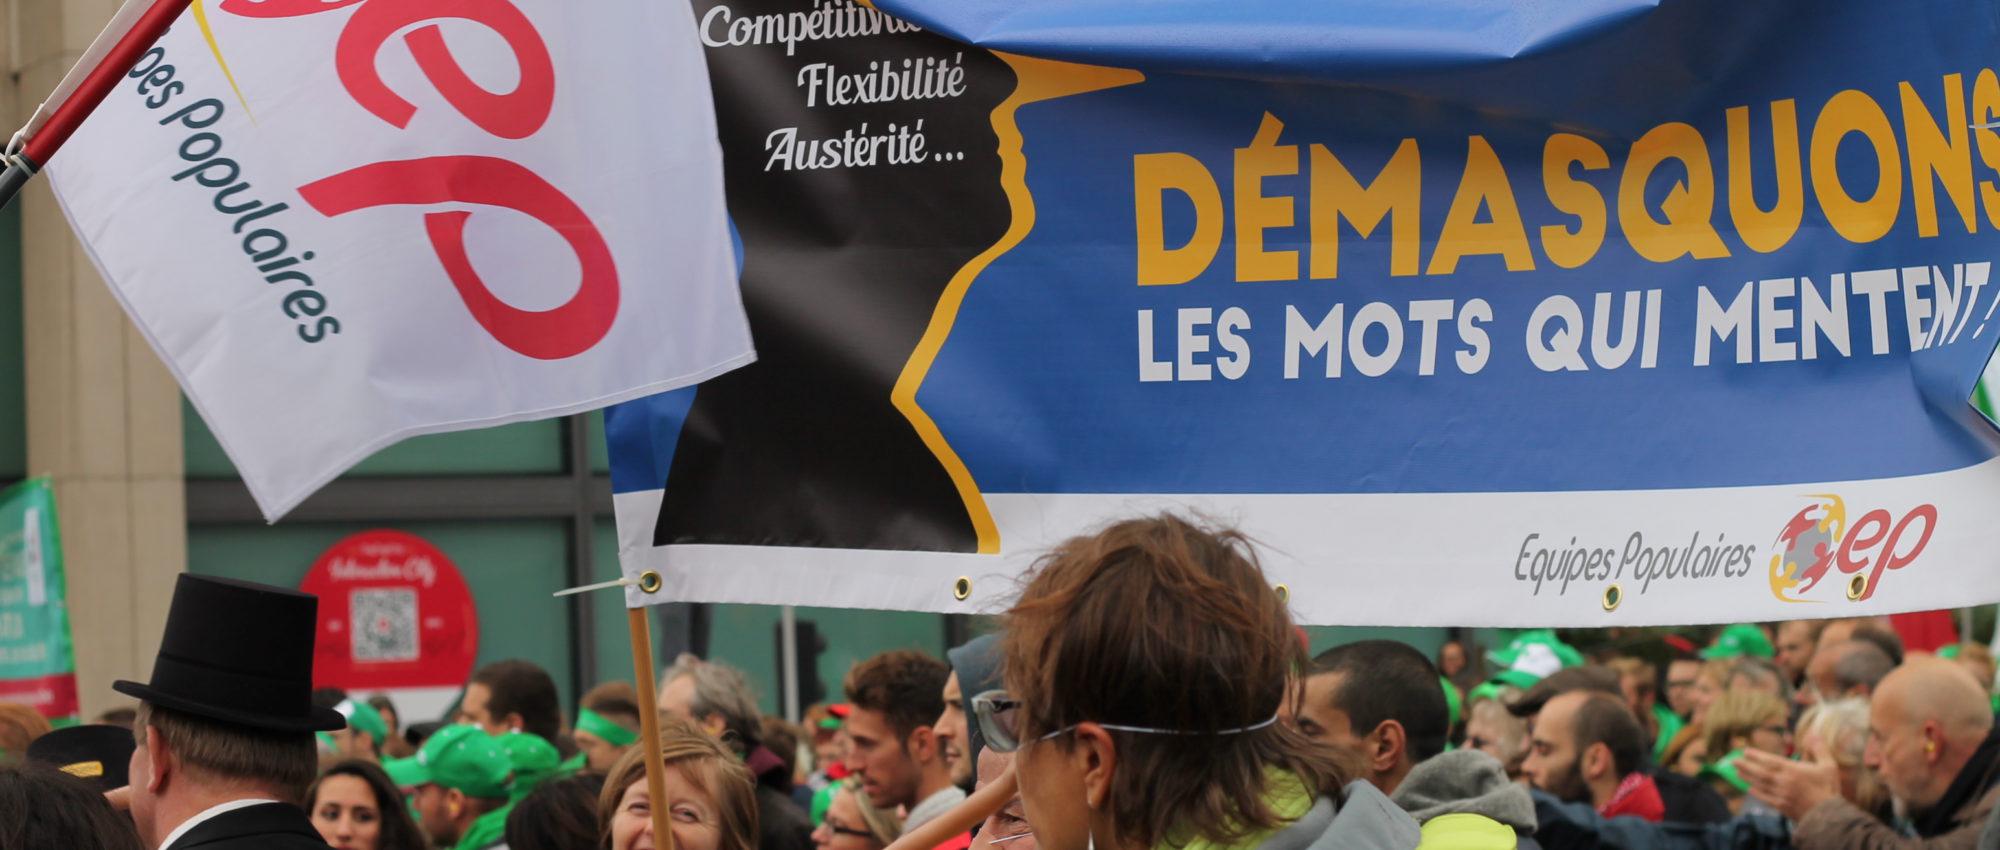 Les Equipes Populaires - Manifestation